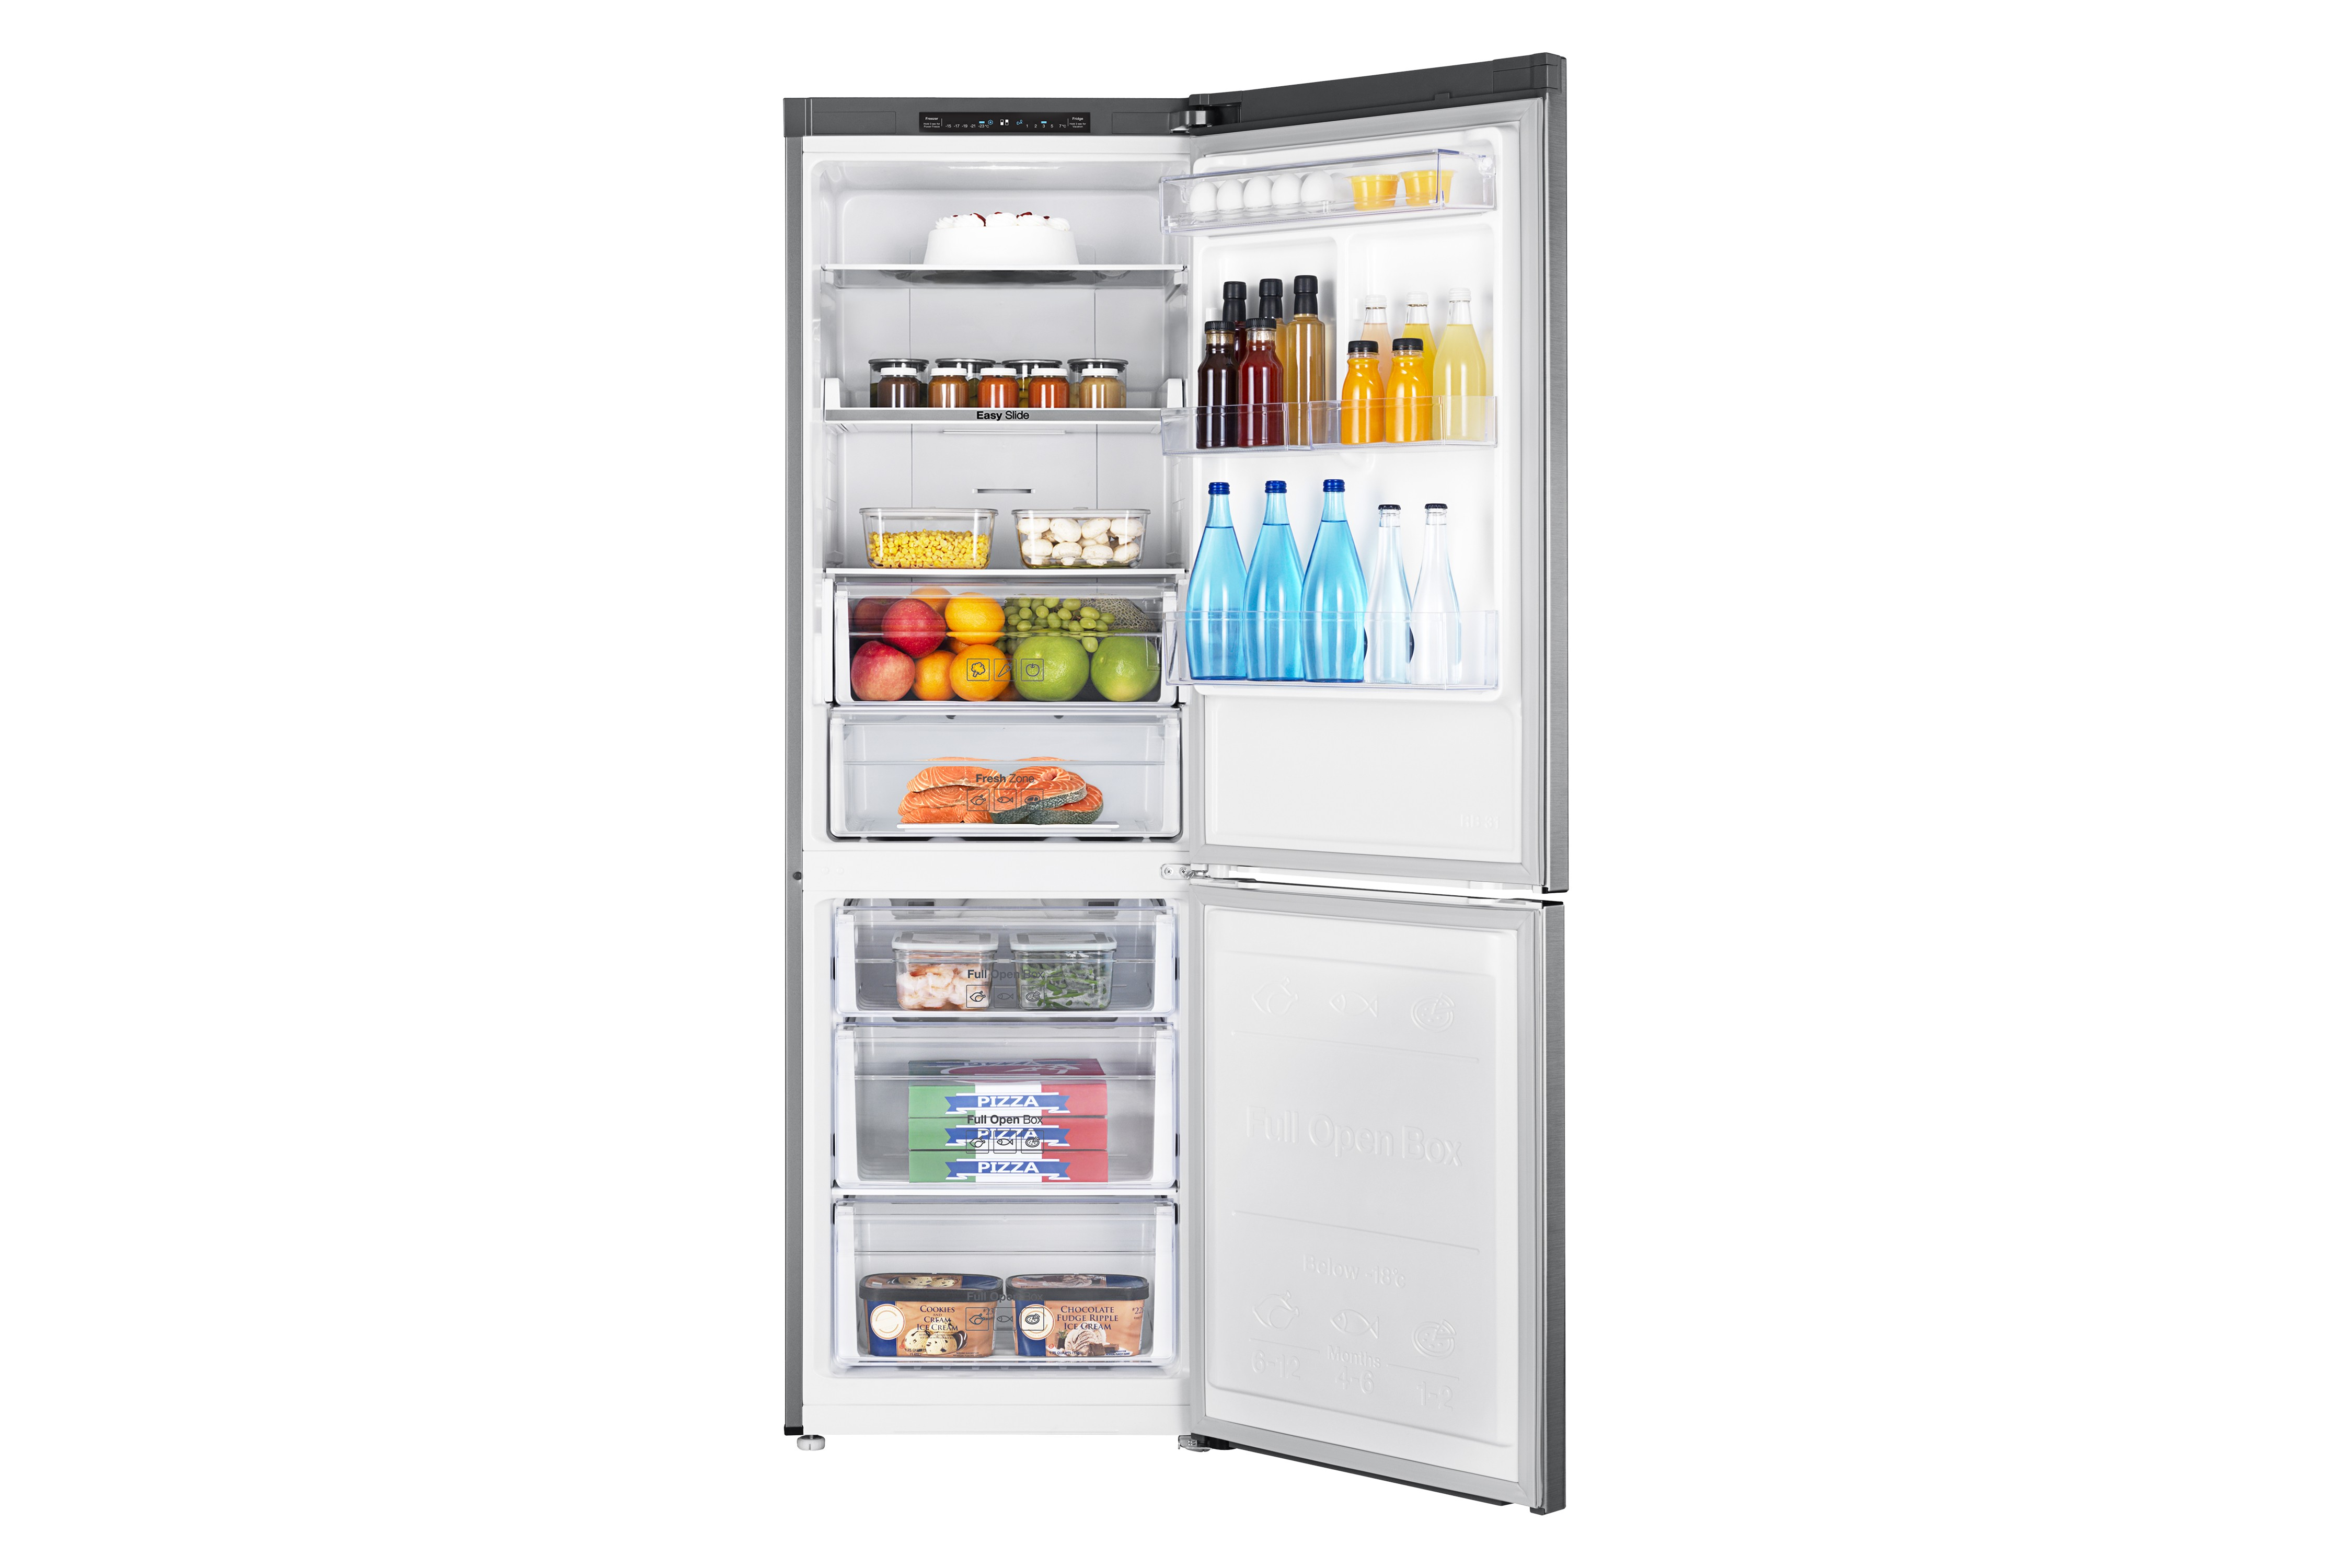 product data samsung rl33j3005sa freestanding a stainless steel fridge freezer fridge freezers. Black Bedroom Furniture Sets. Home Design Ideas